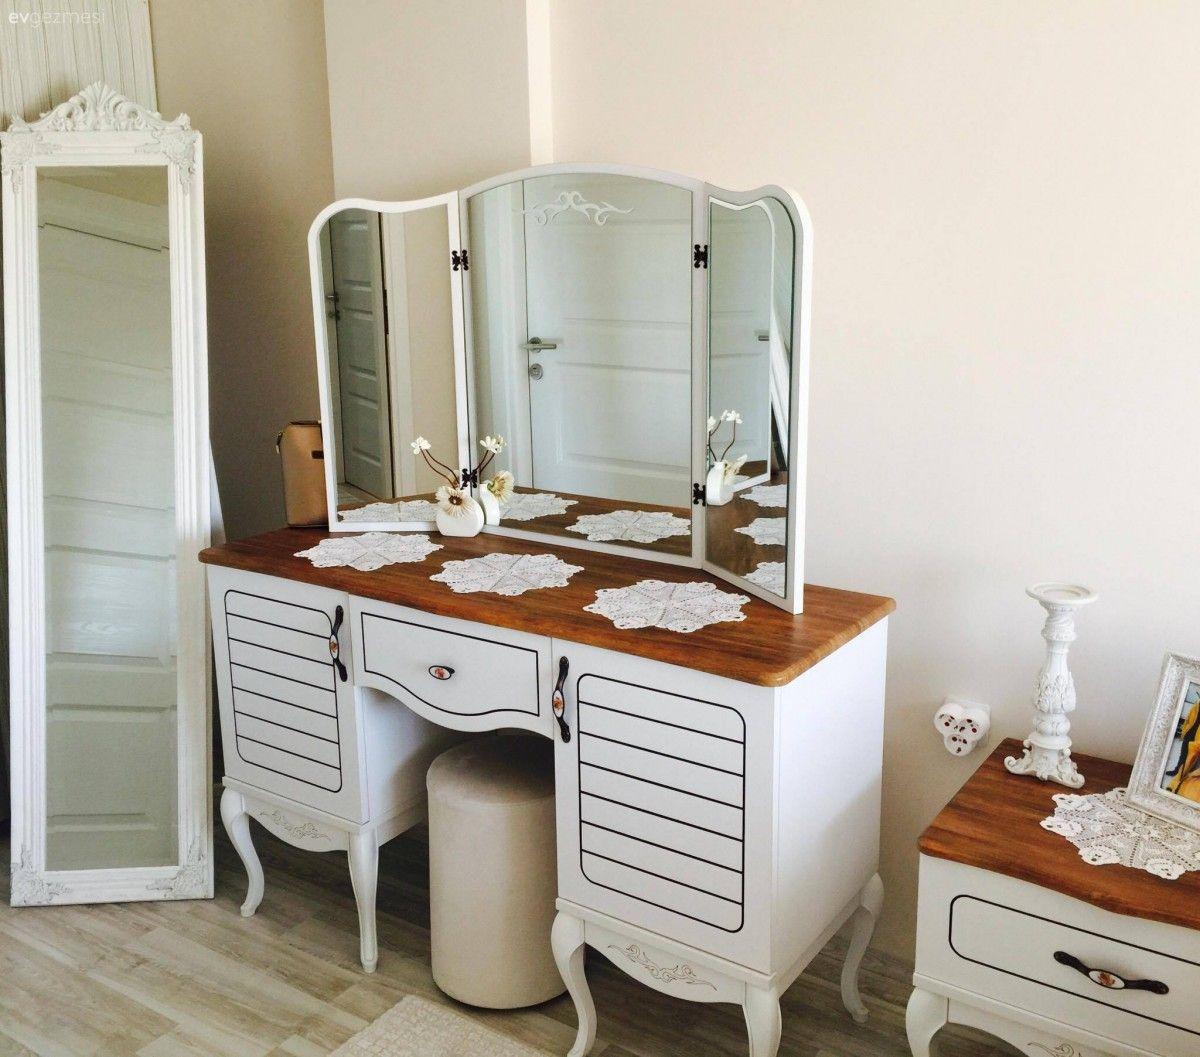 Hereve hal dan 2013 modern hal modelleri ev dekorasyon - Elobi Salon Tak M Modern Salon Tak Mlar Berke Mobilya Home Pinterest